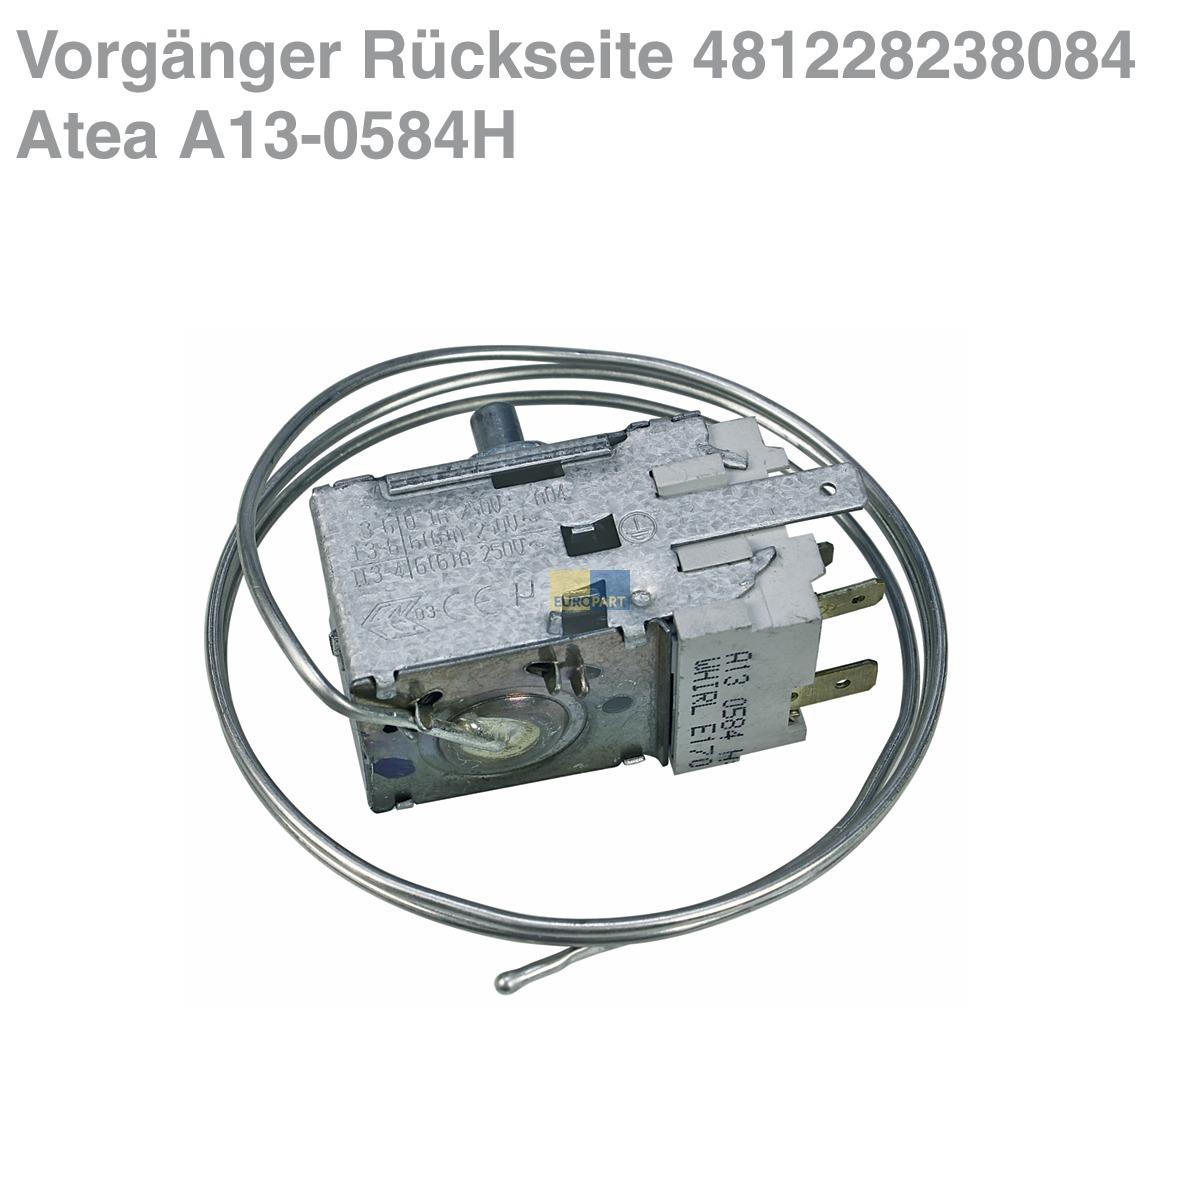 Thermostat K59 S1890 500 Ranco 915mm Kapillarrohr Abea Hausgerte Wiring Diagram 3x63mm Amp Ot